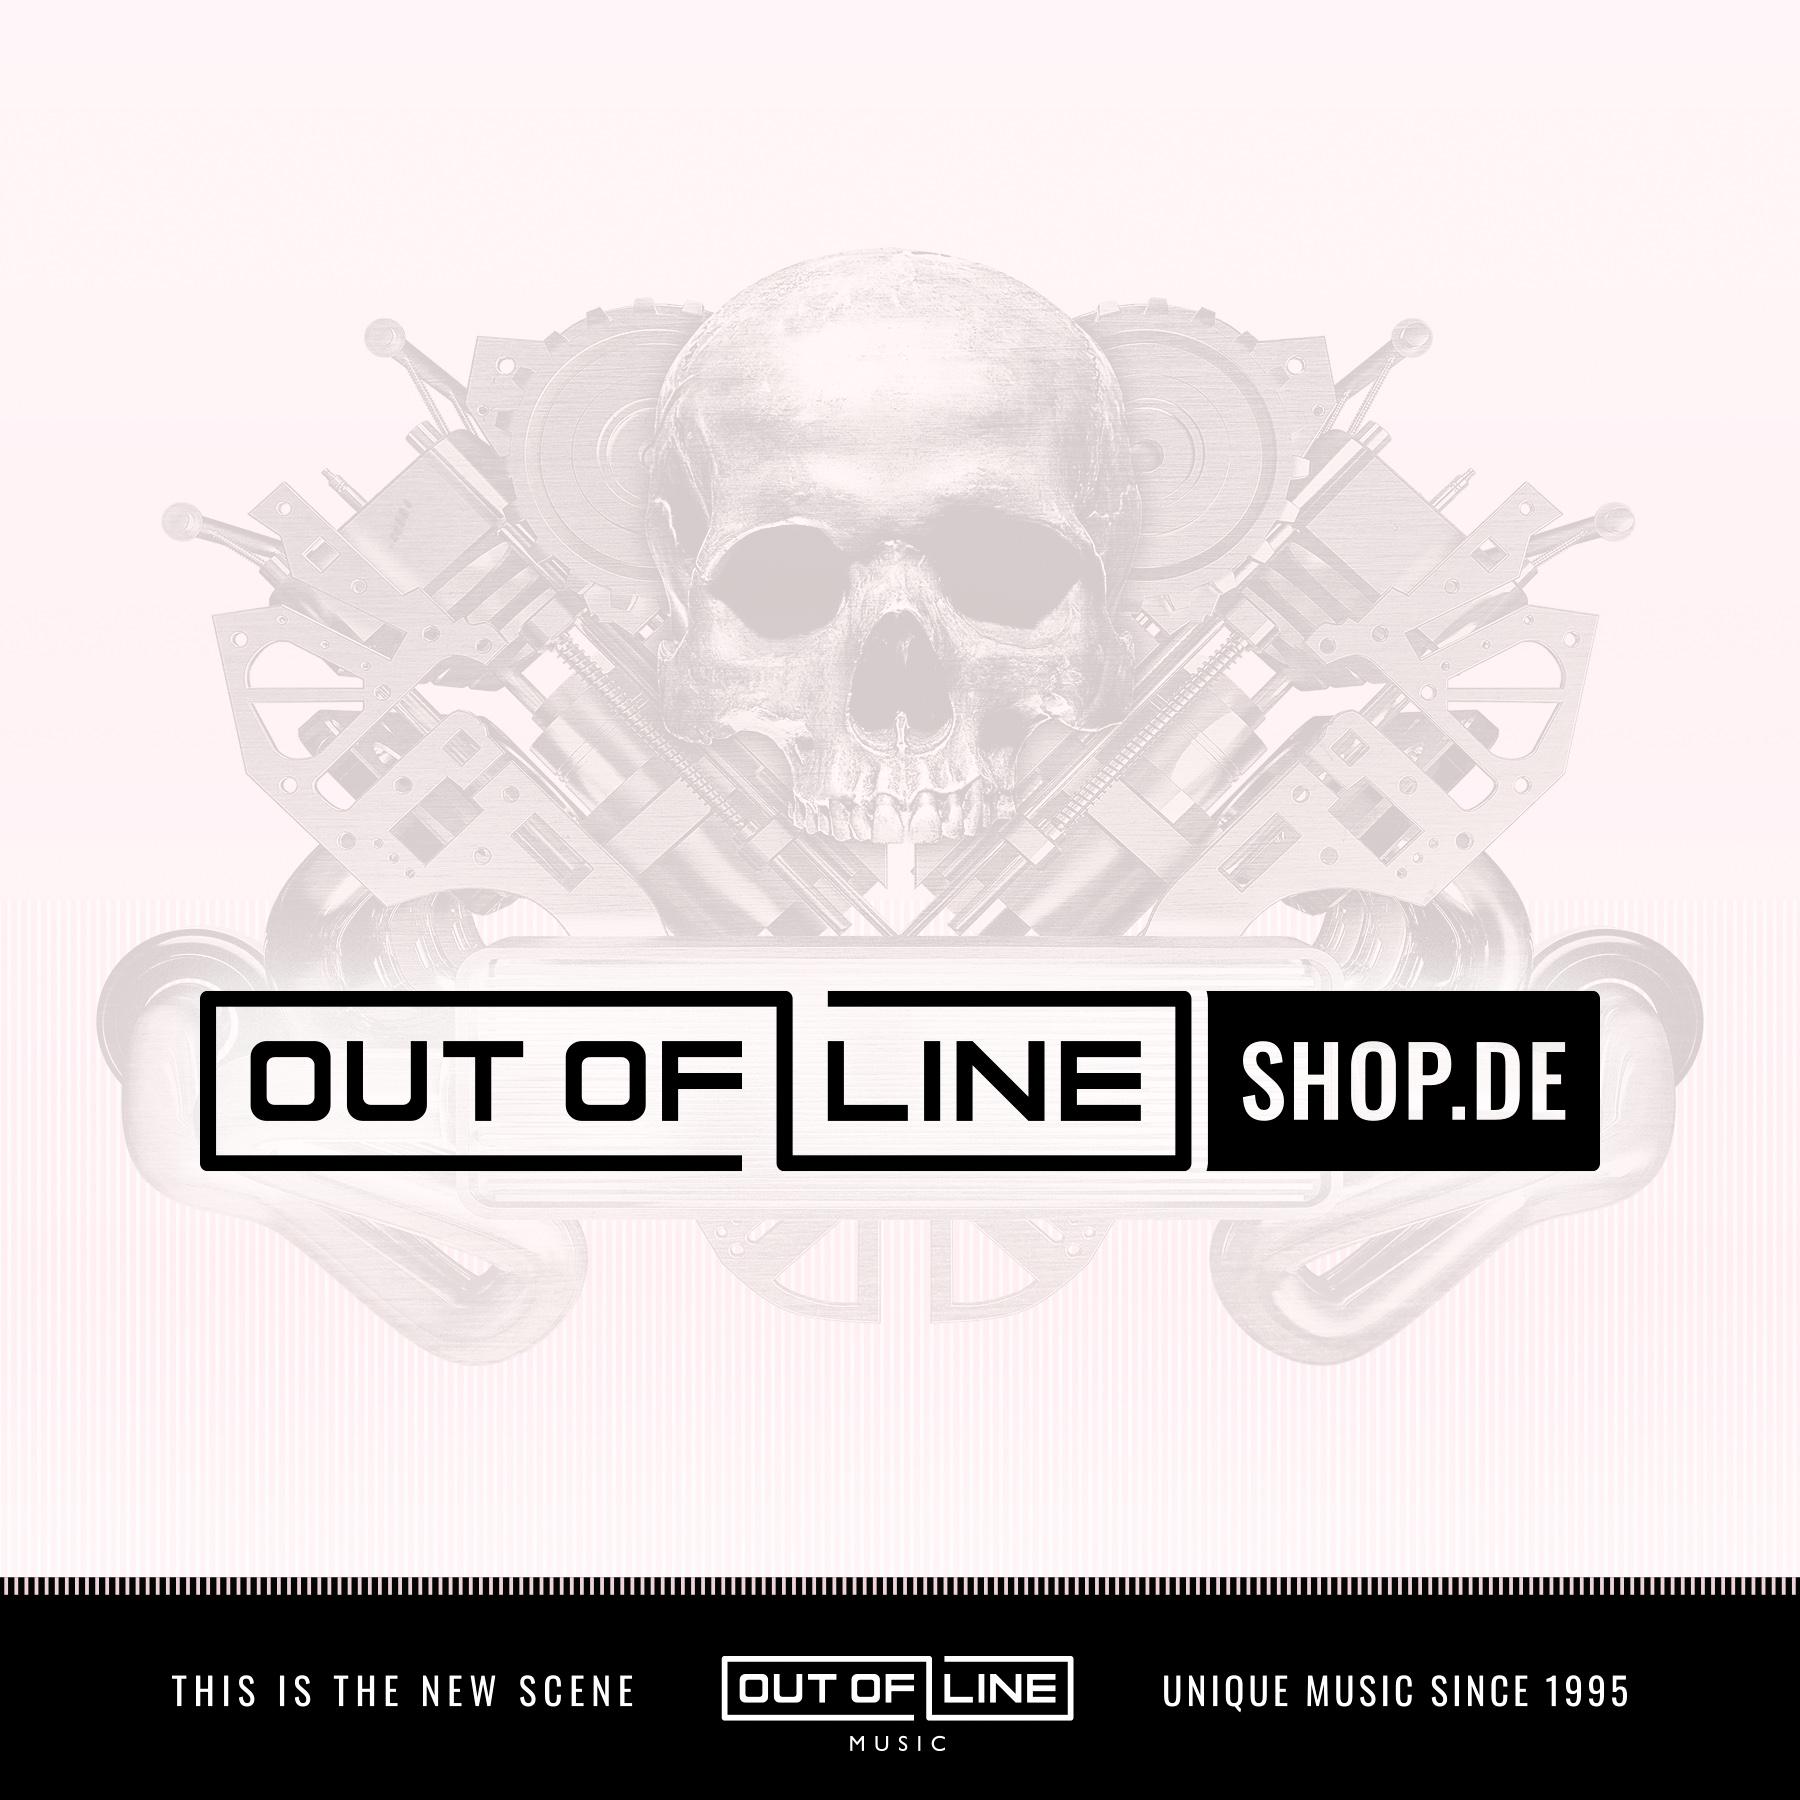 EGGVN - La Era de la Bestia - Limited Mailorder Only Edition!